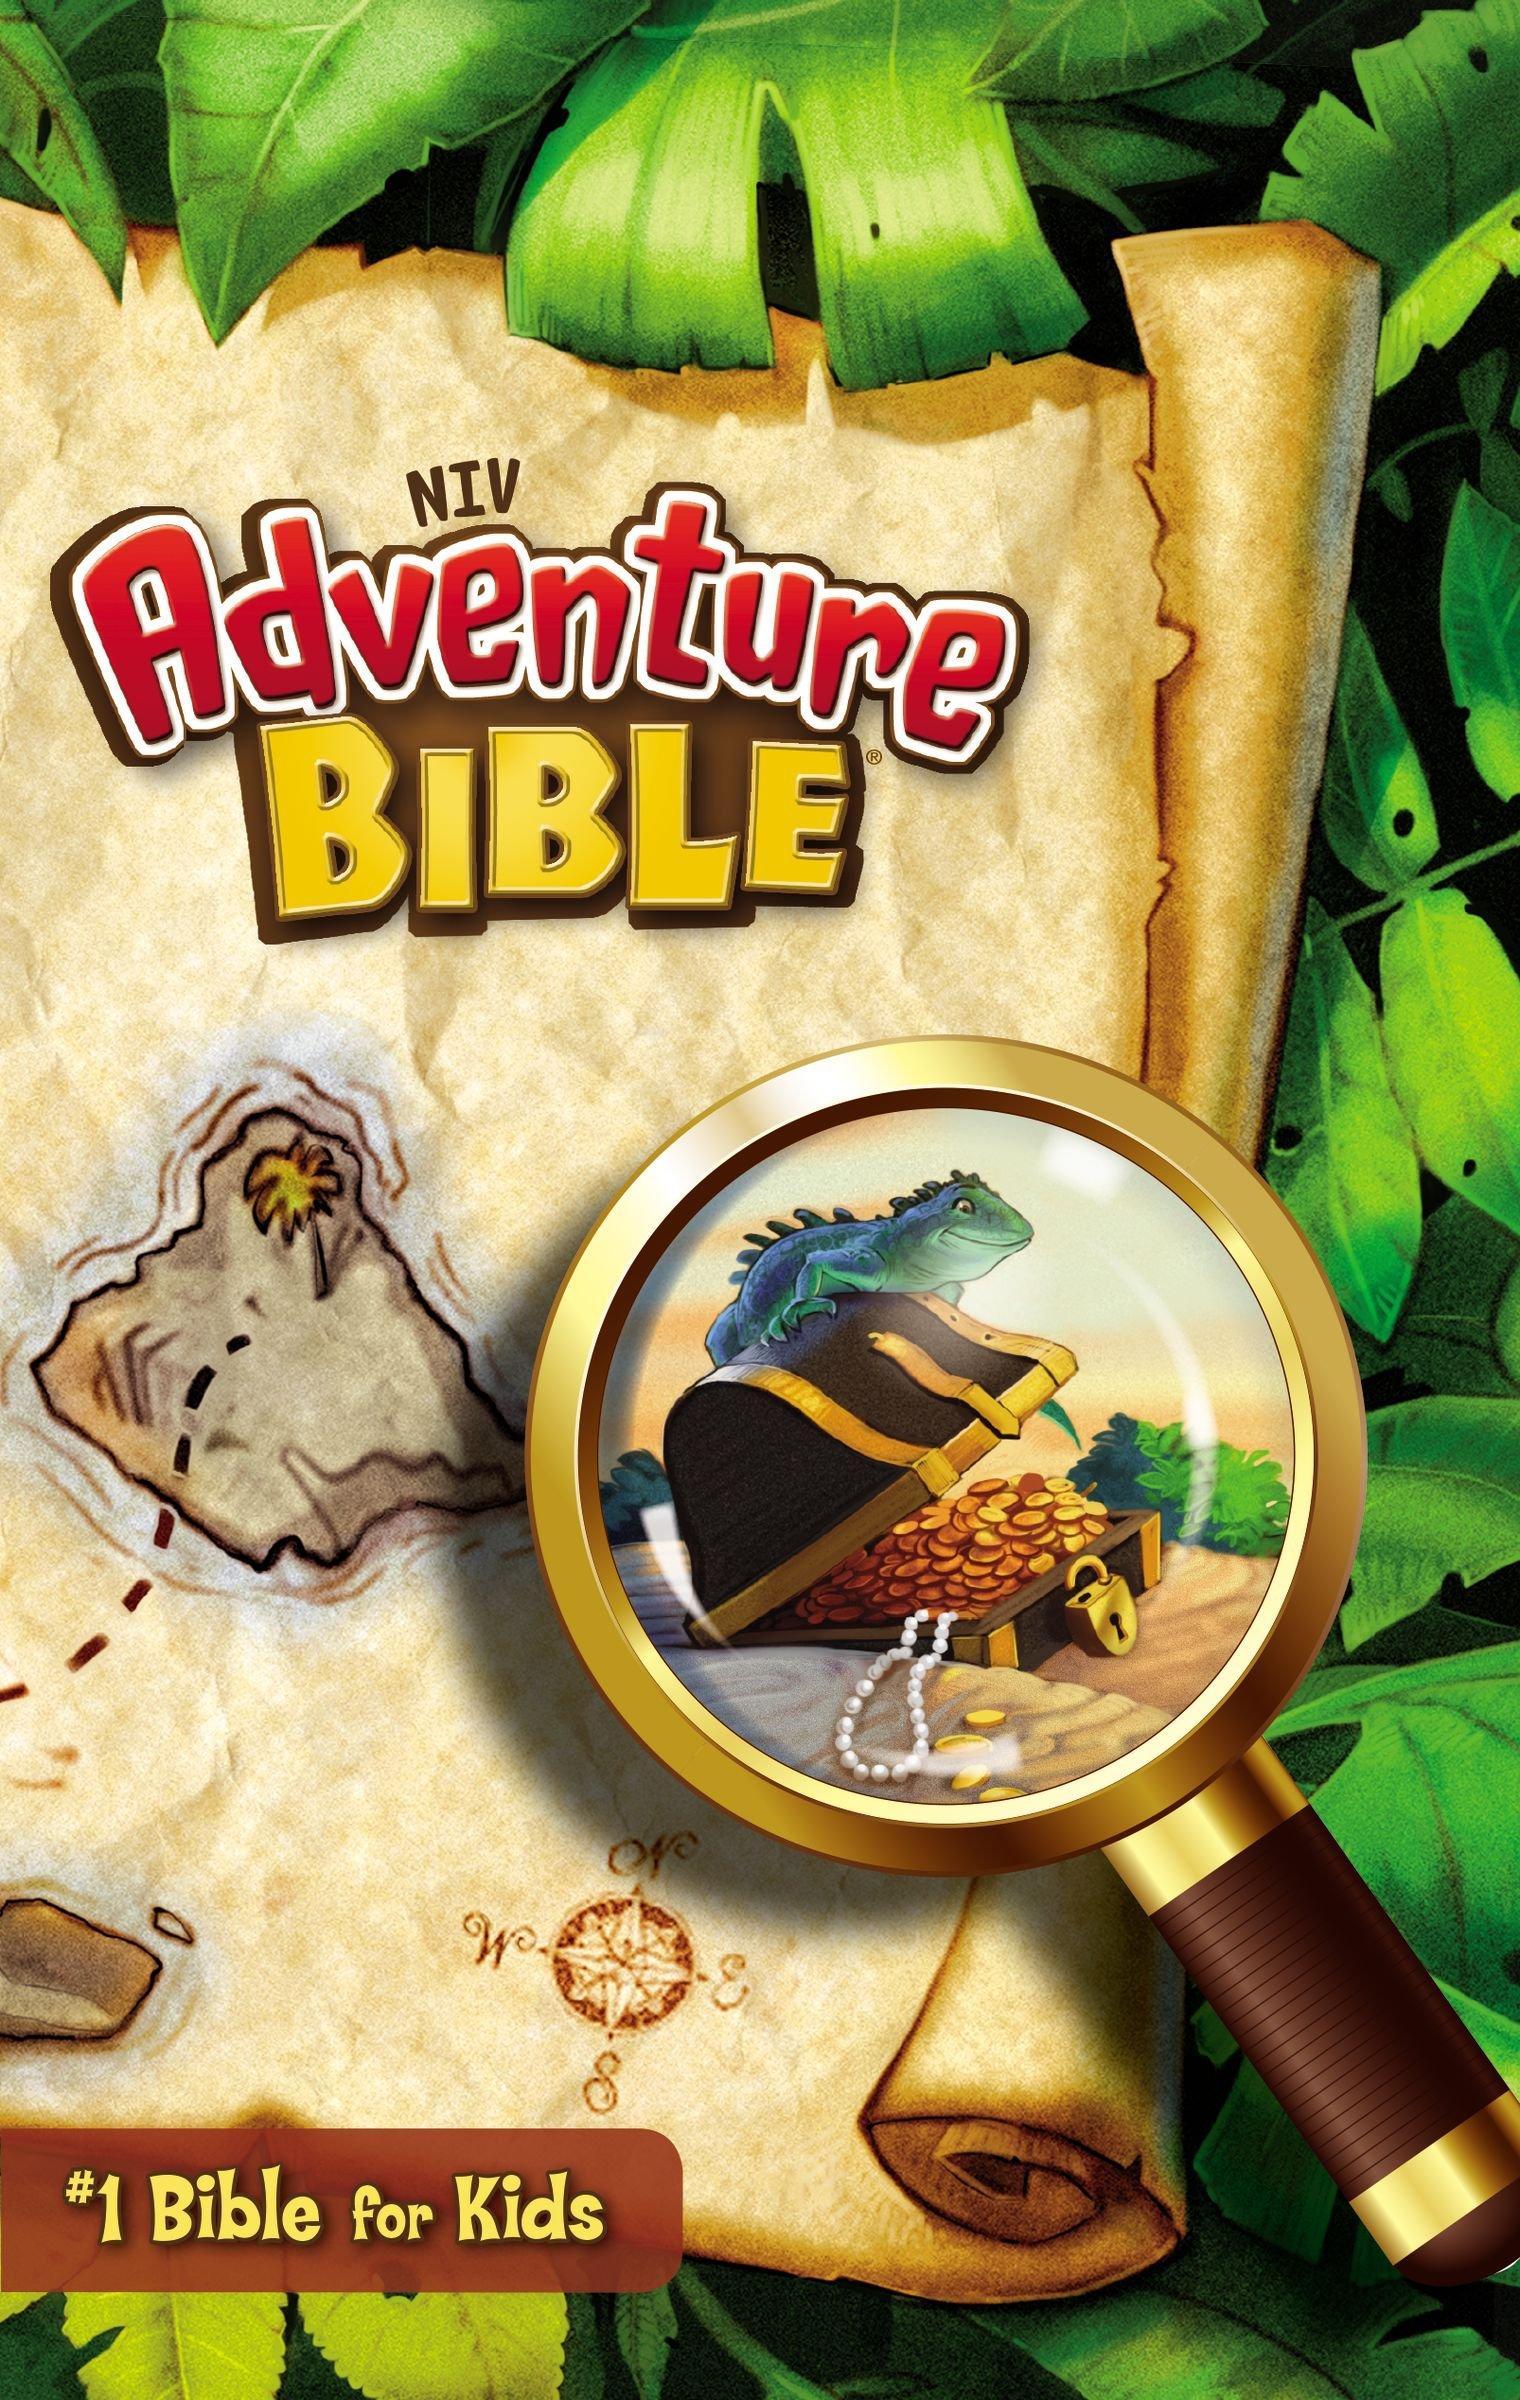 NIV, Adventure Bible, Paperback, Full Color: Zondervan, Lawrence O.  Richards: 9780310727484: Amazon.com: Books